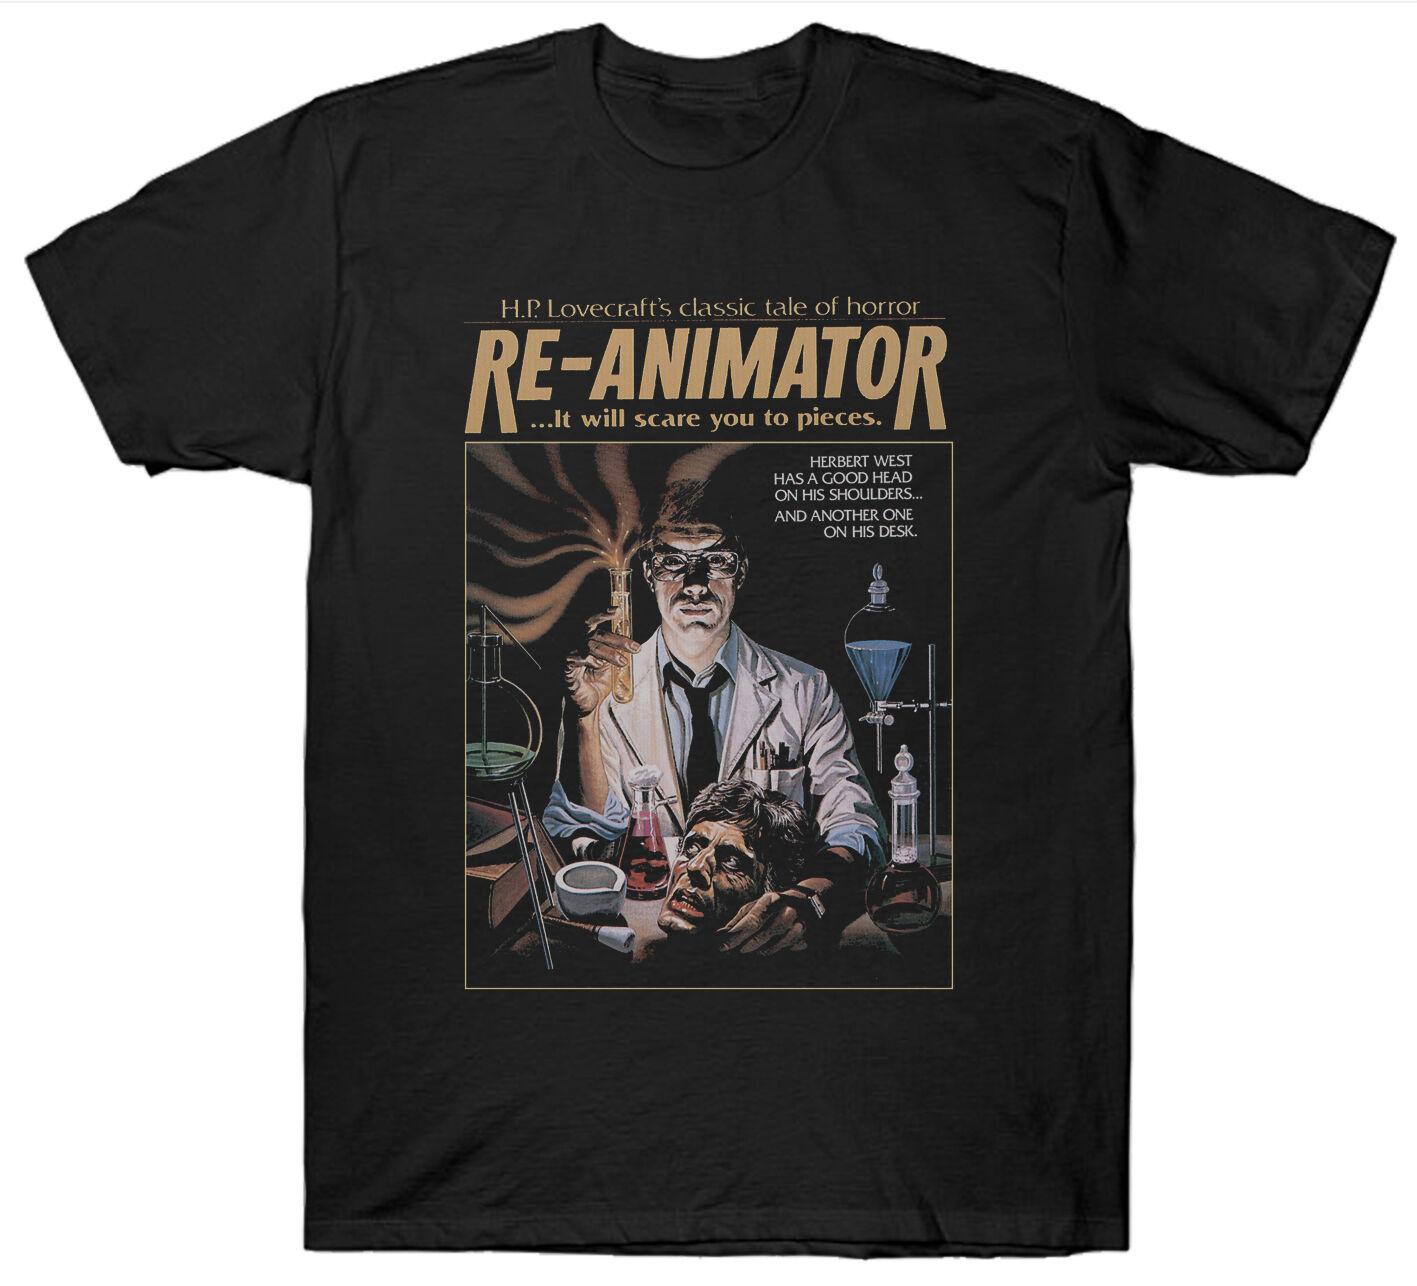 Re Animator футболка Фэнтези ужас 1970-е фильм Hp Lovecraft